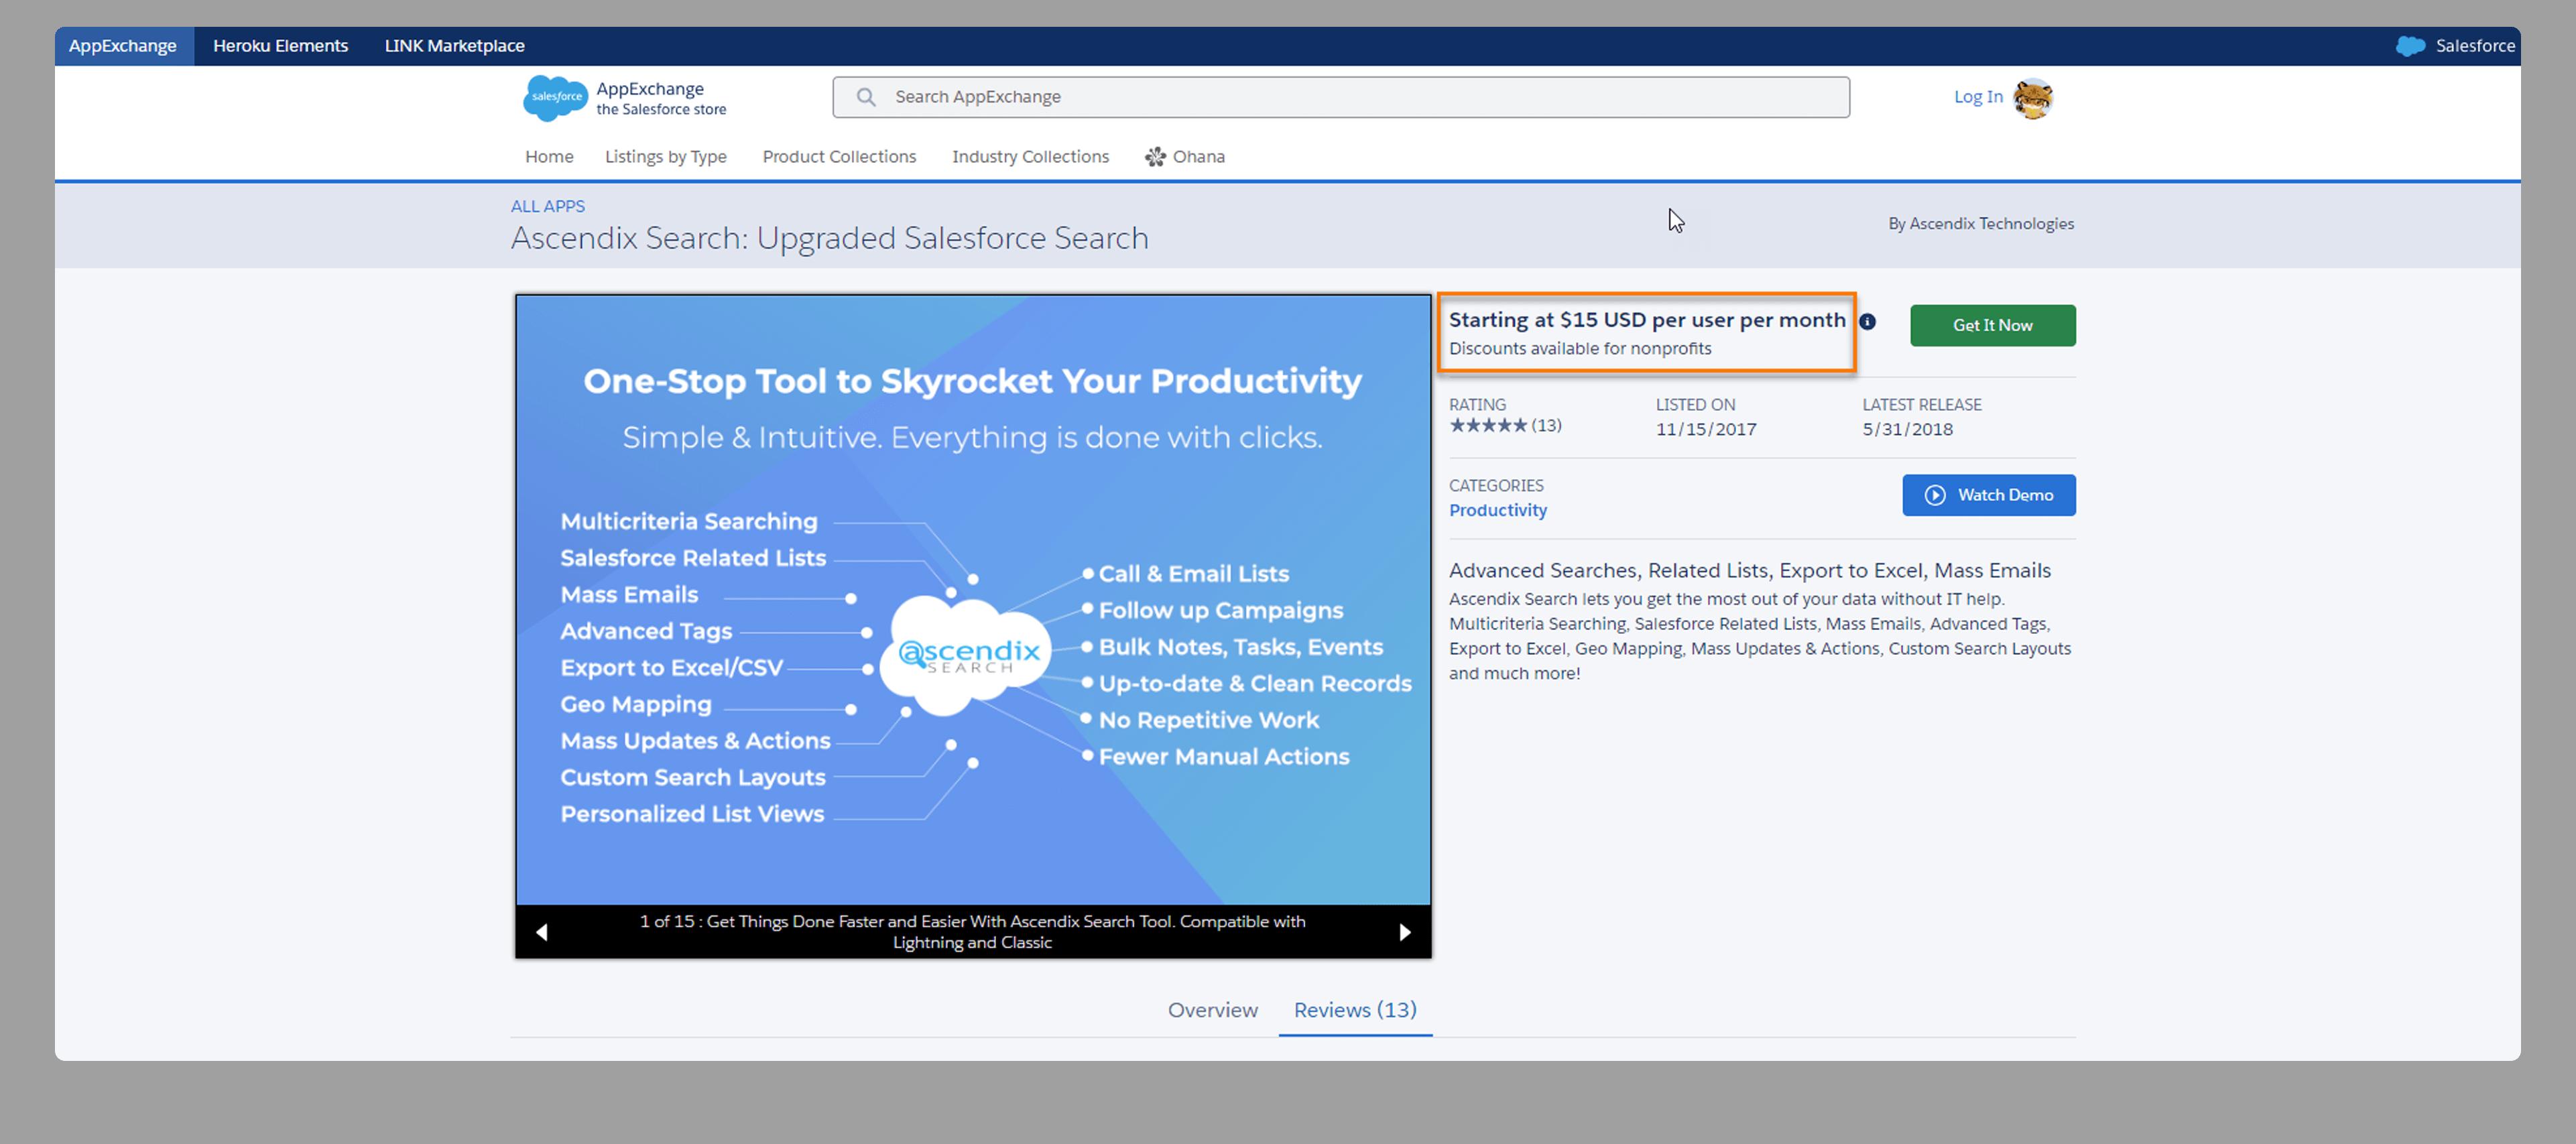 Salesforce App Pricing on AppExchange